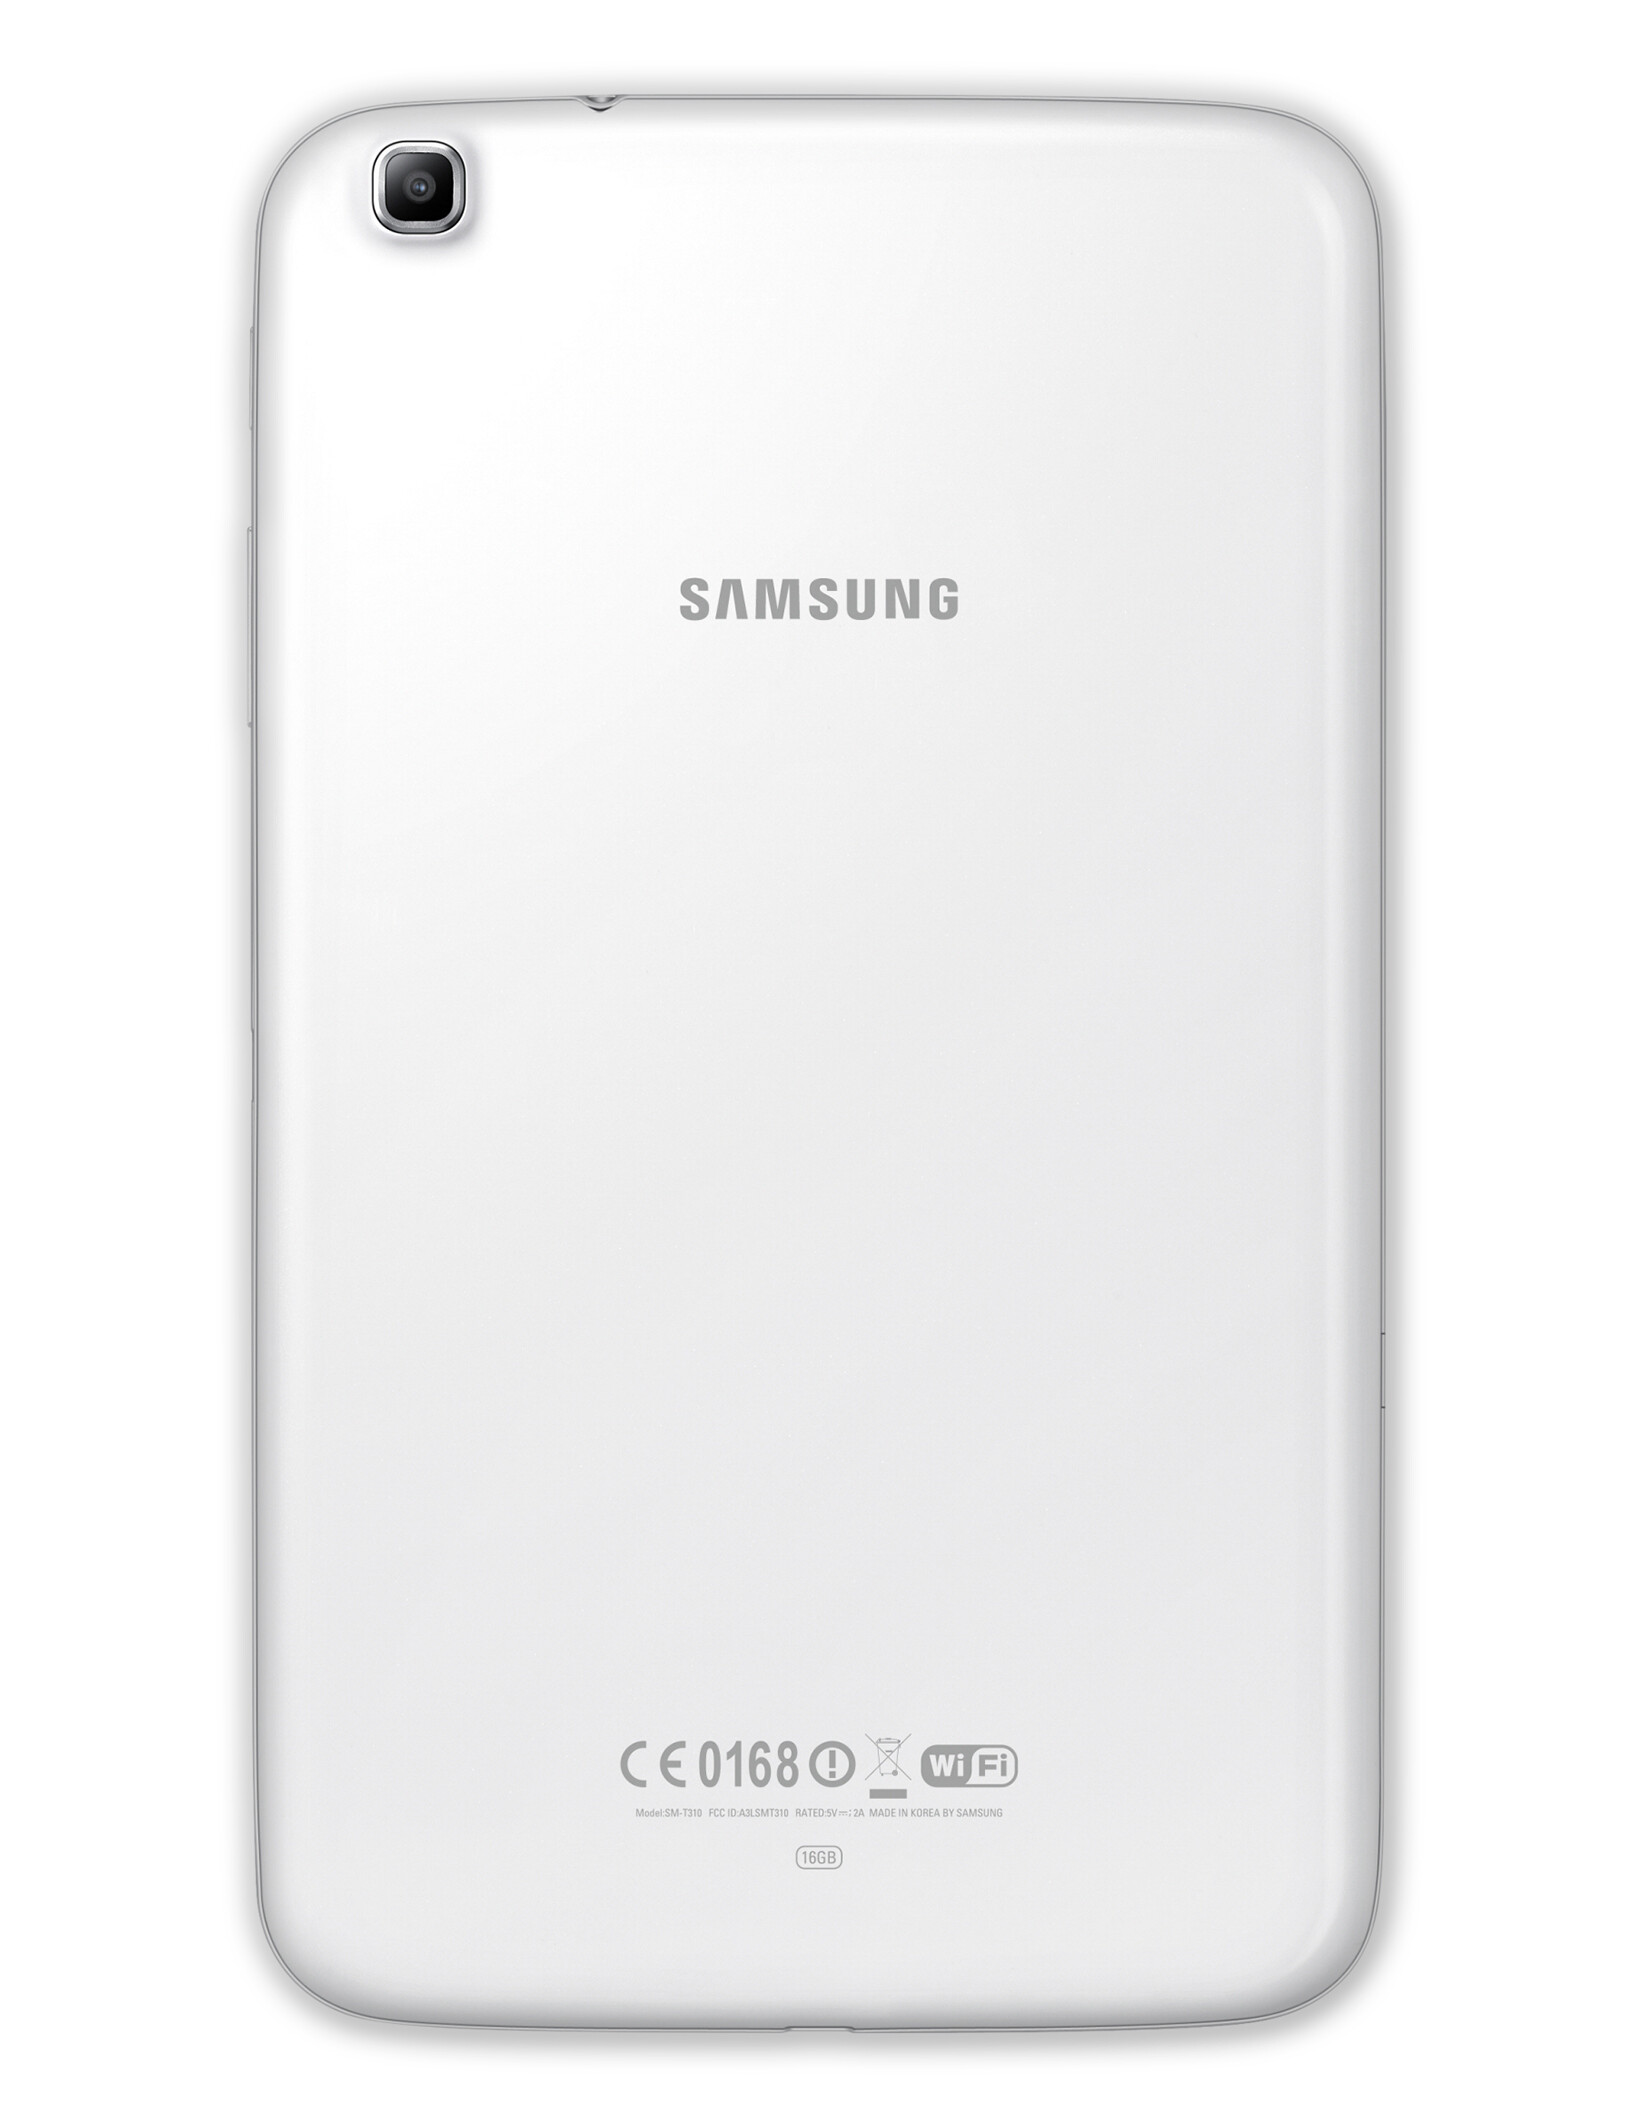 Samsung Galaxy Tab 3 Specifications